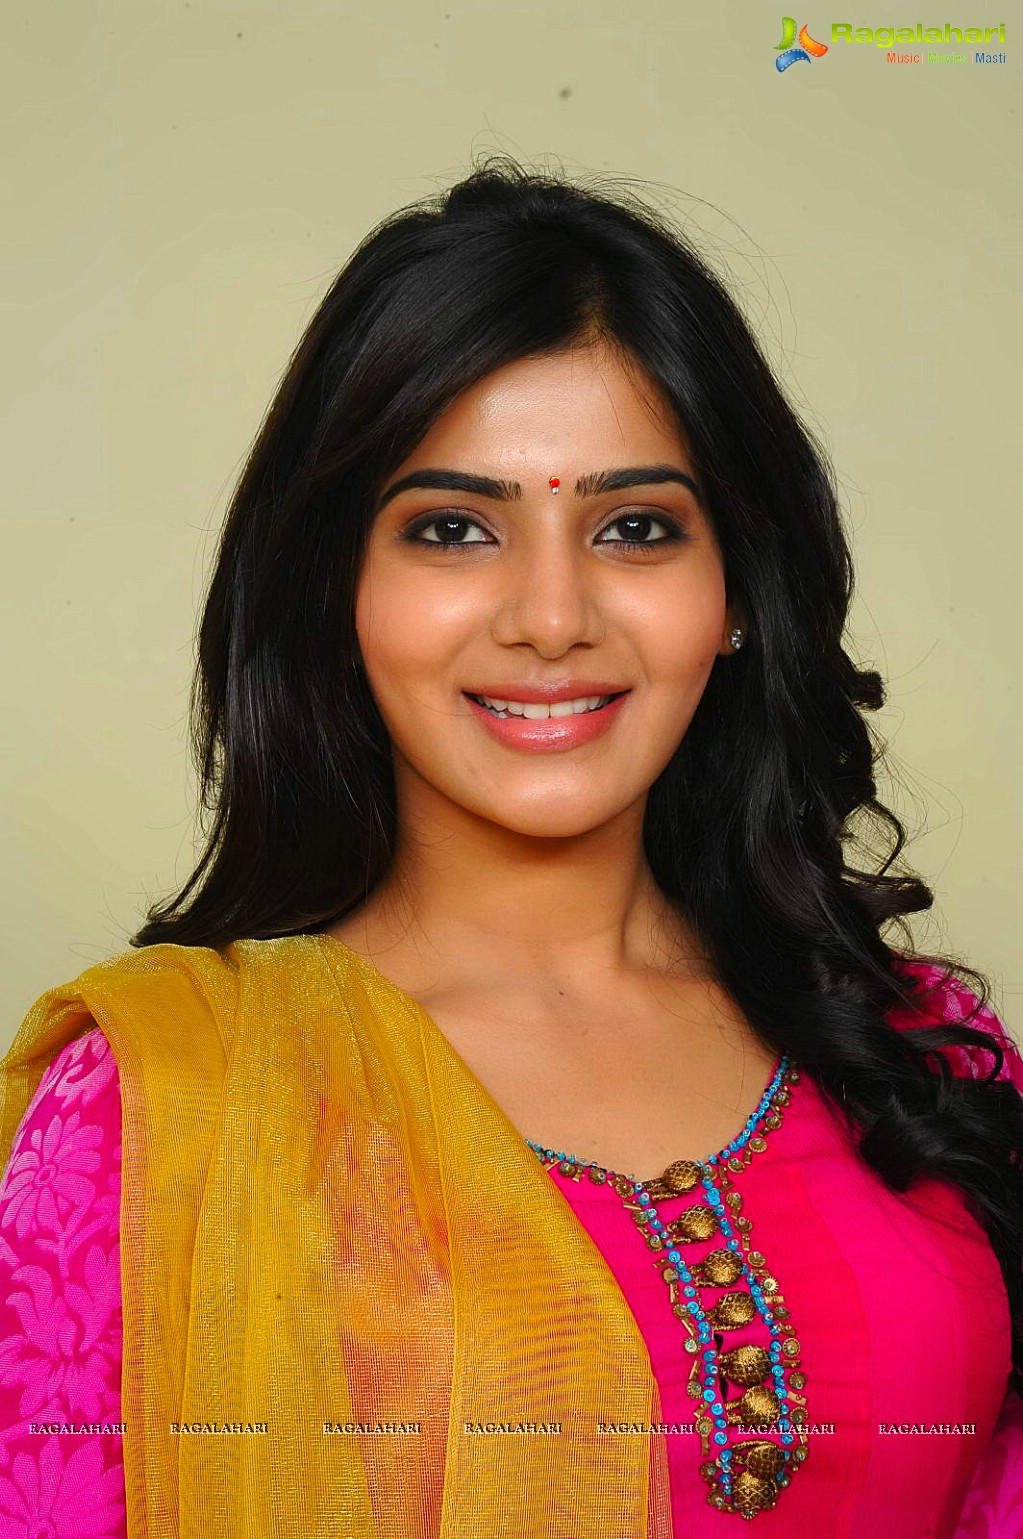 samantha image 25 | telugu actress posters,images, photos